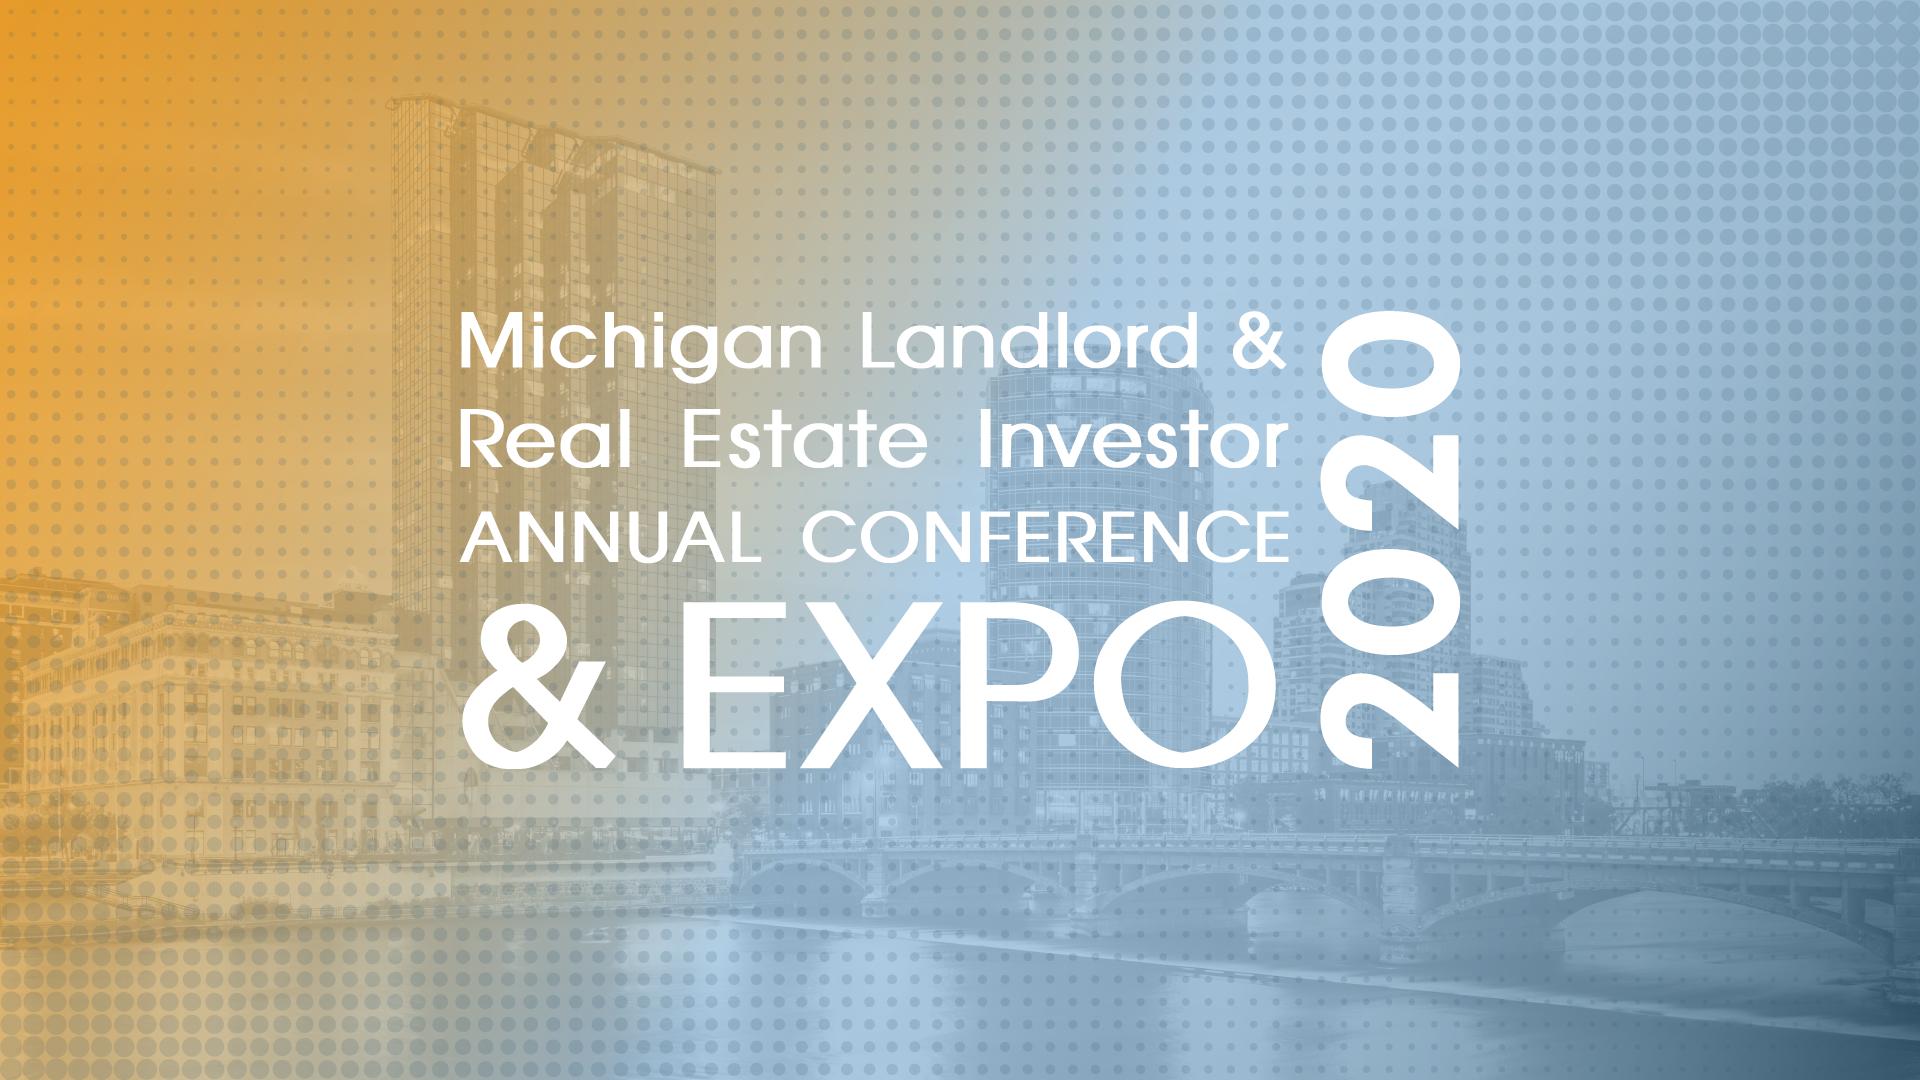 Van Andel Events 2020.2020 Michigan Landlord Real Estate Investor Conference